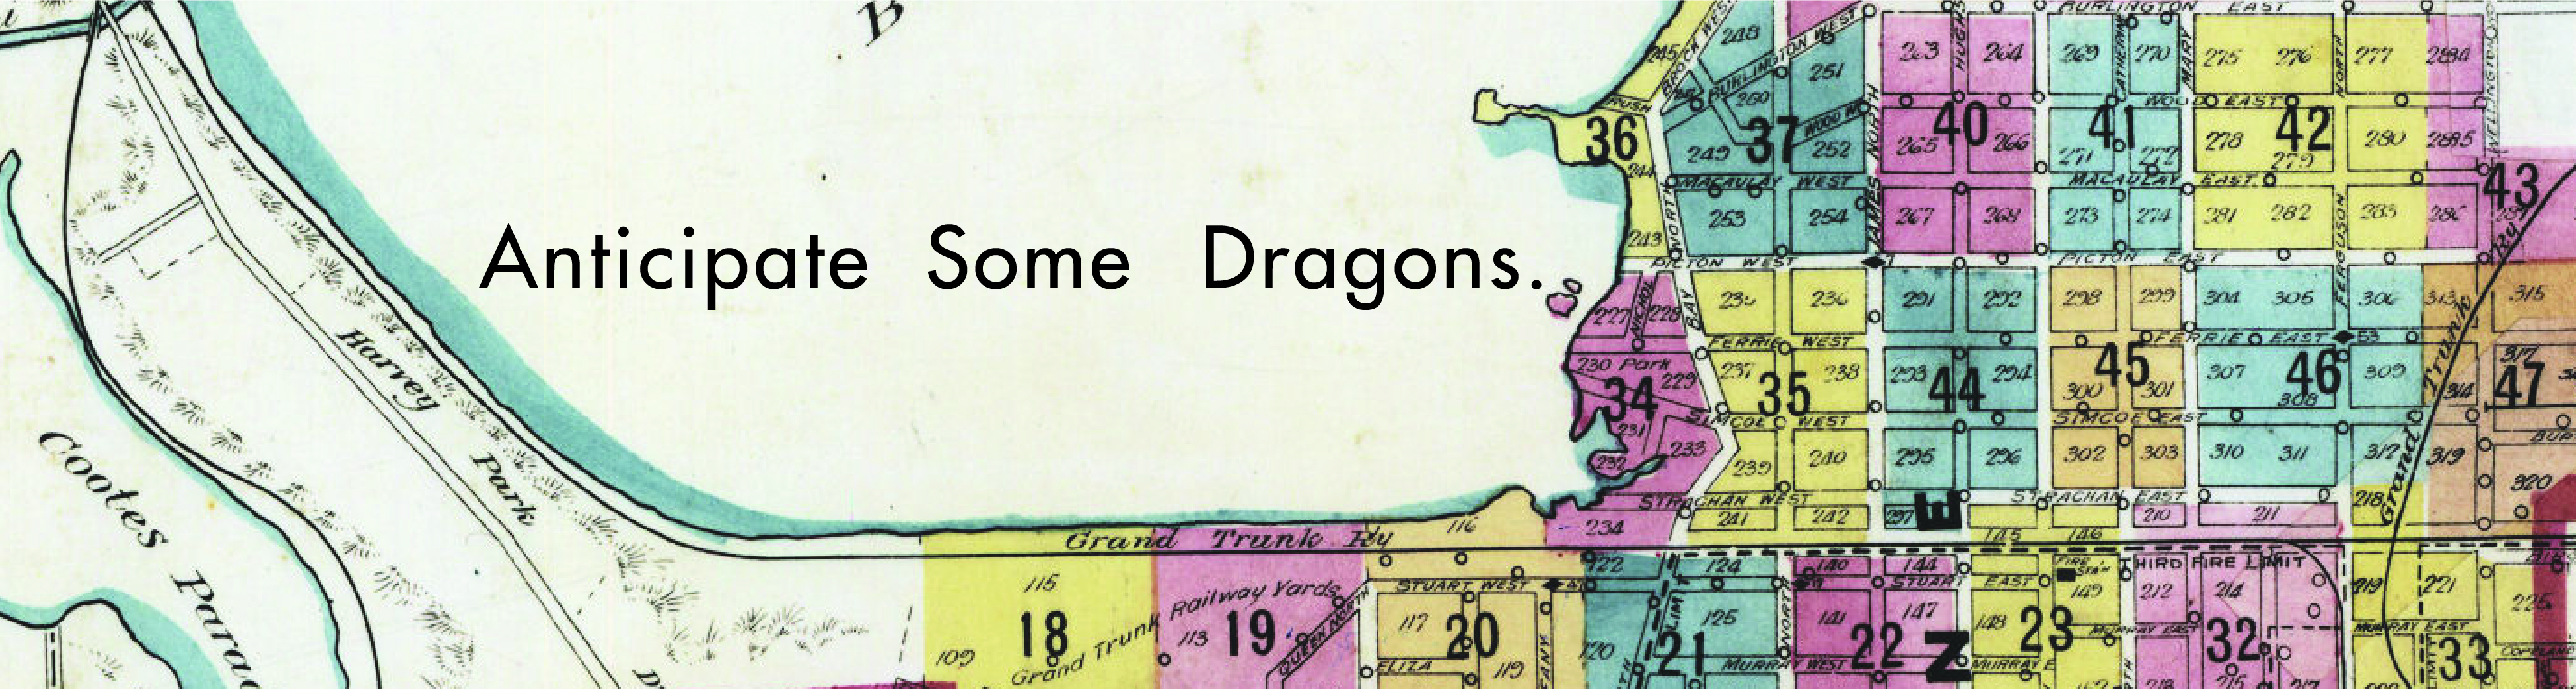 Anticipate Some Dragons